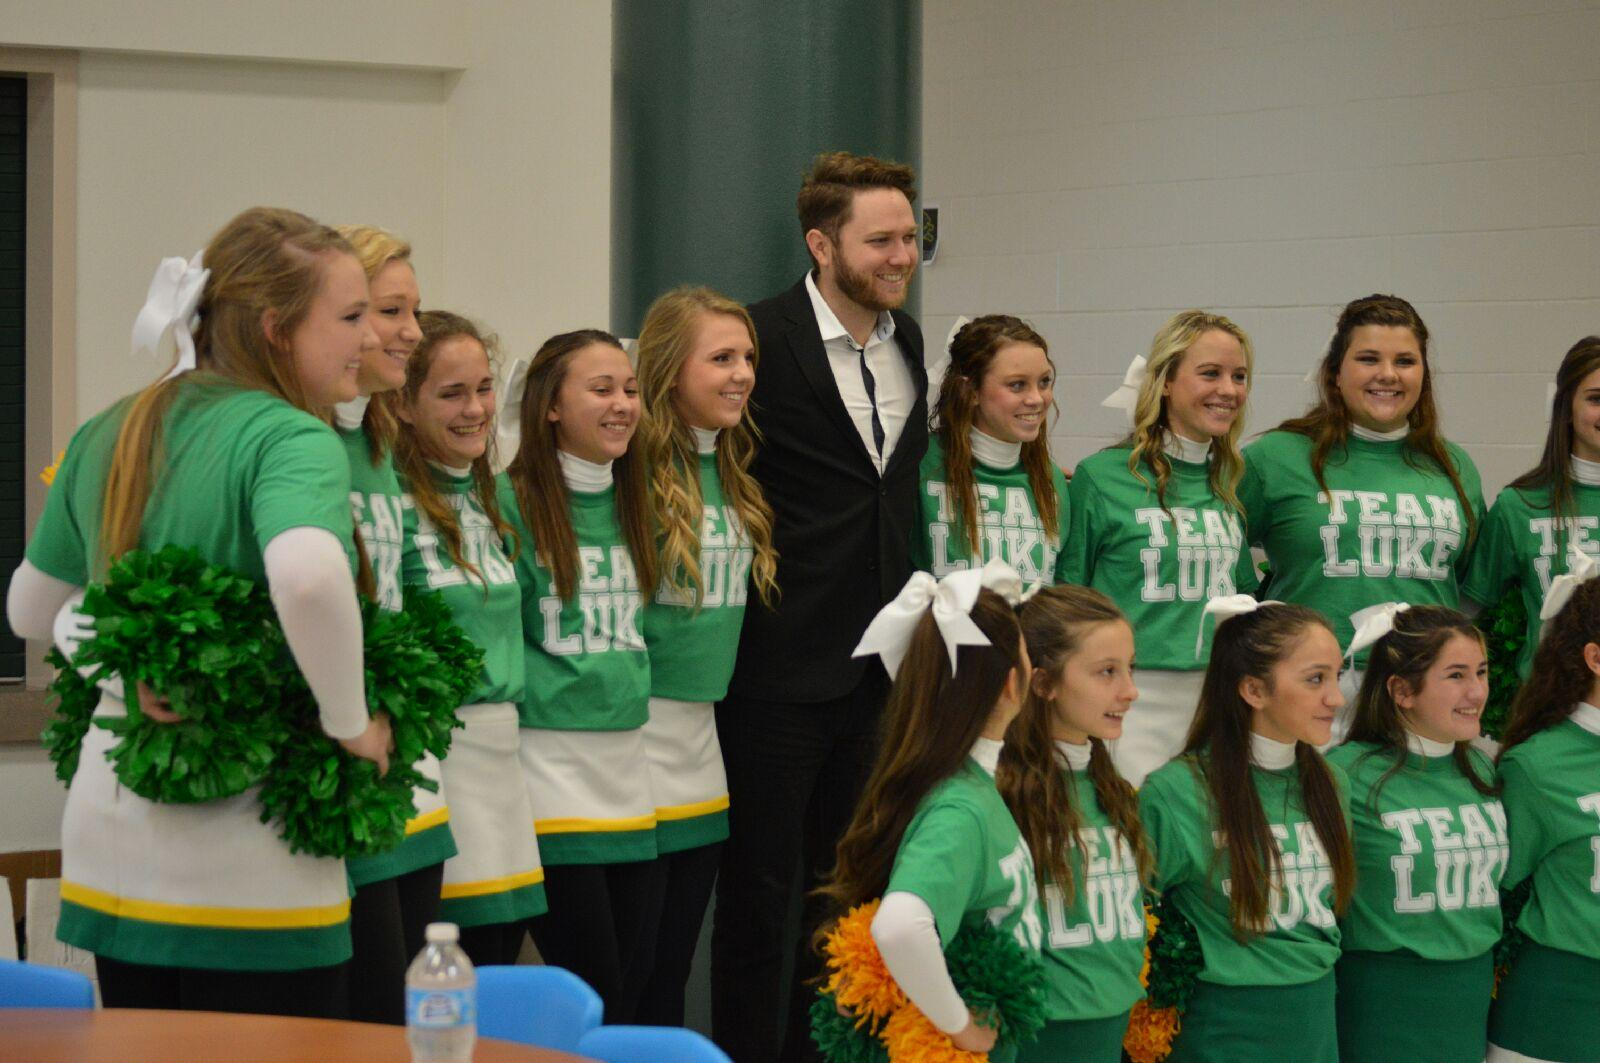 Luke Wade visits Dublin ISD on Thursday, Dec. 4, to celebrate Luke Wade Day. || Photo by Brooke Mendenhall